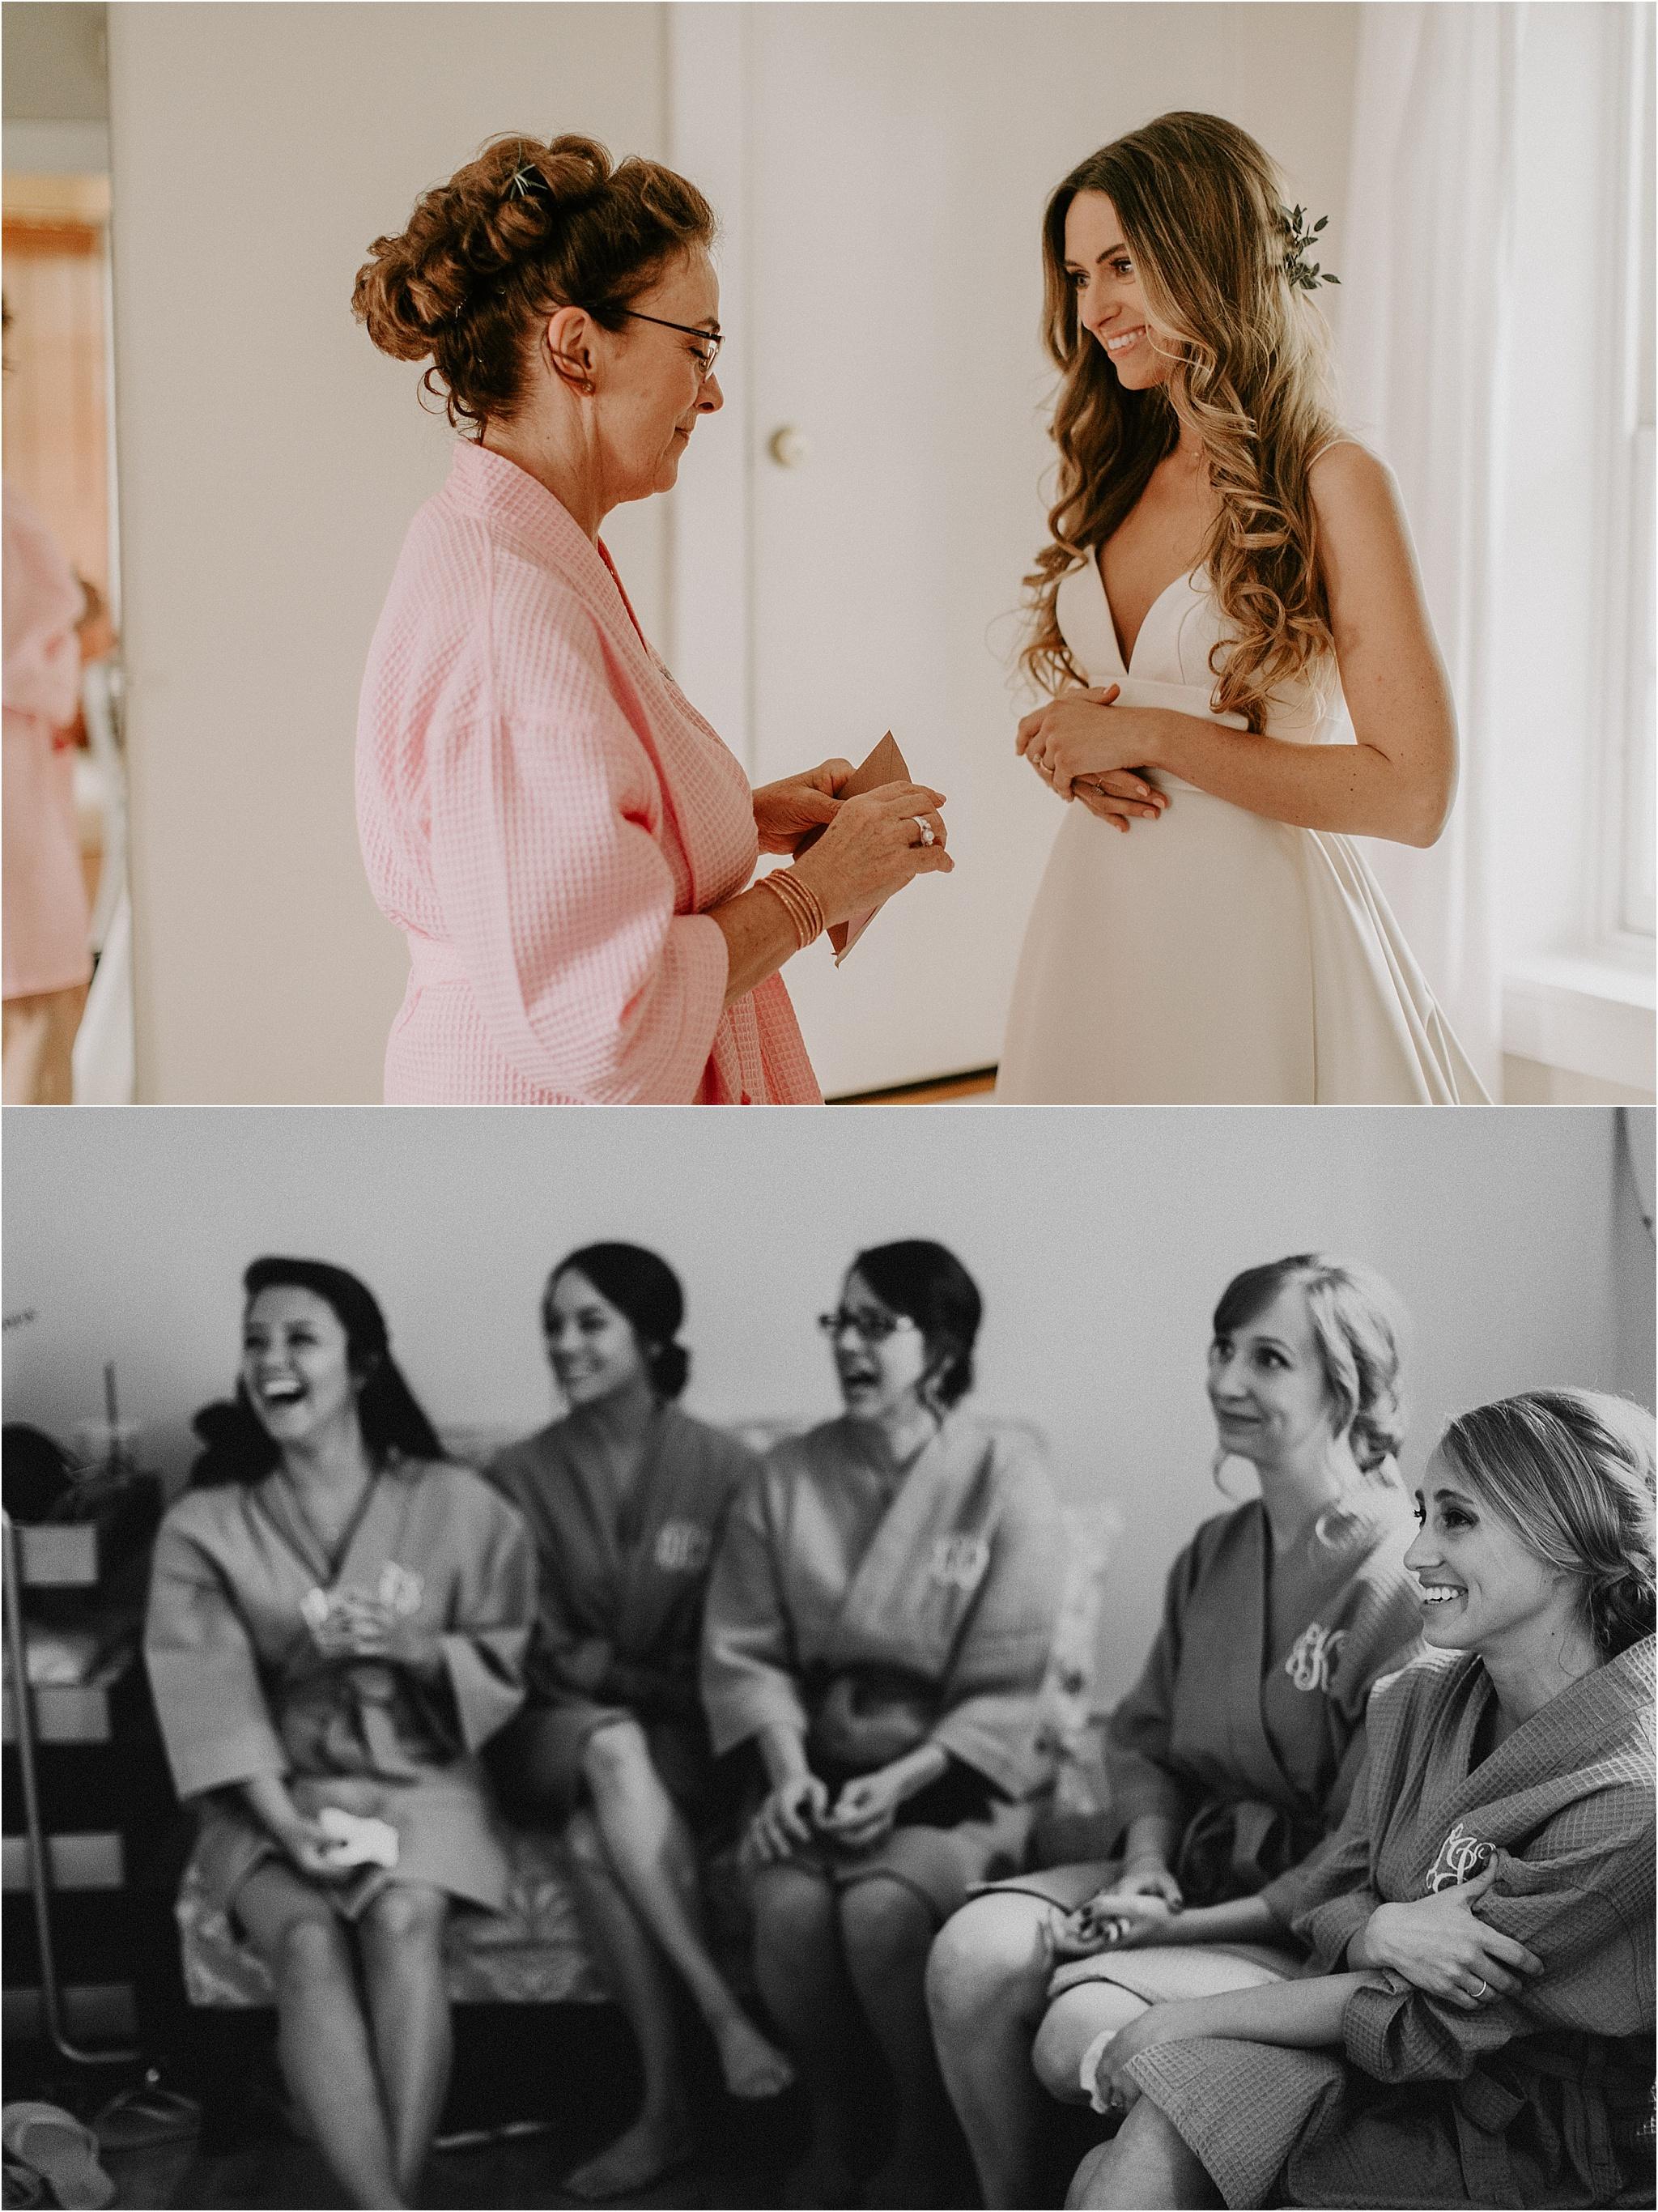 Sarah_Brookhart_Lancaster_PA_Wedding_Photographer_0013.jpg